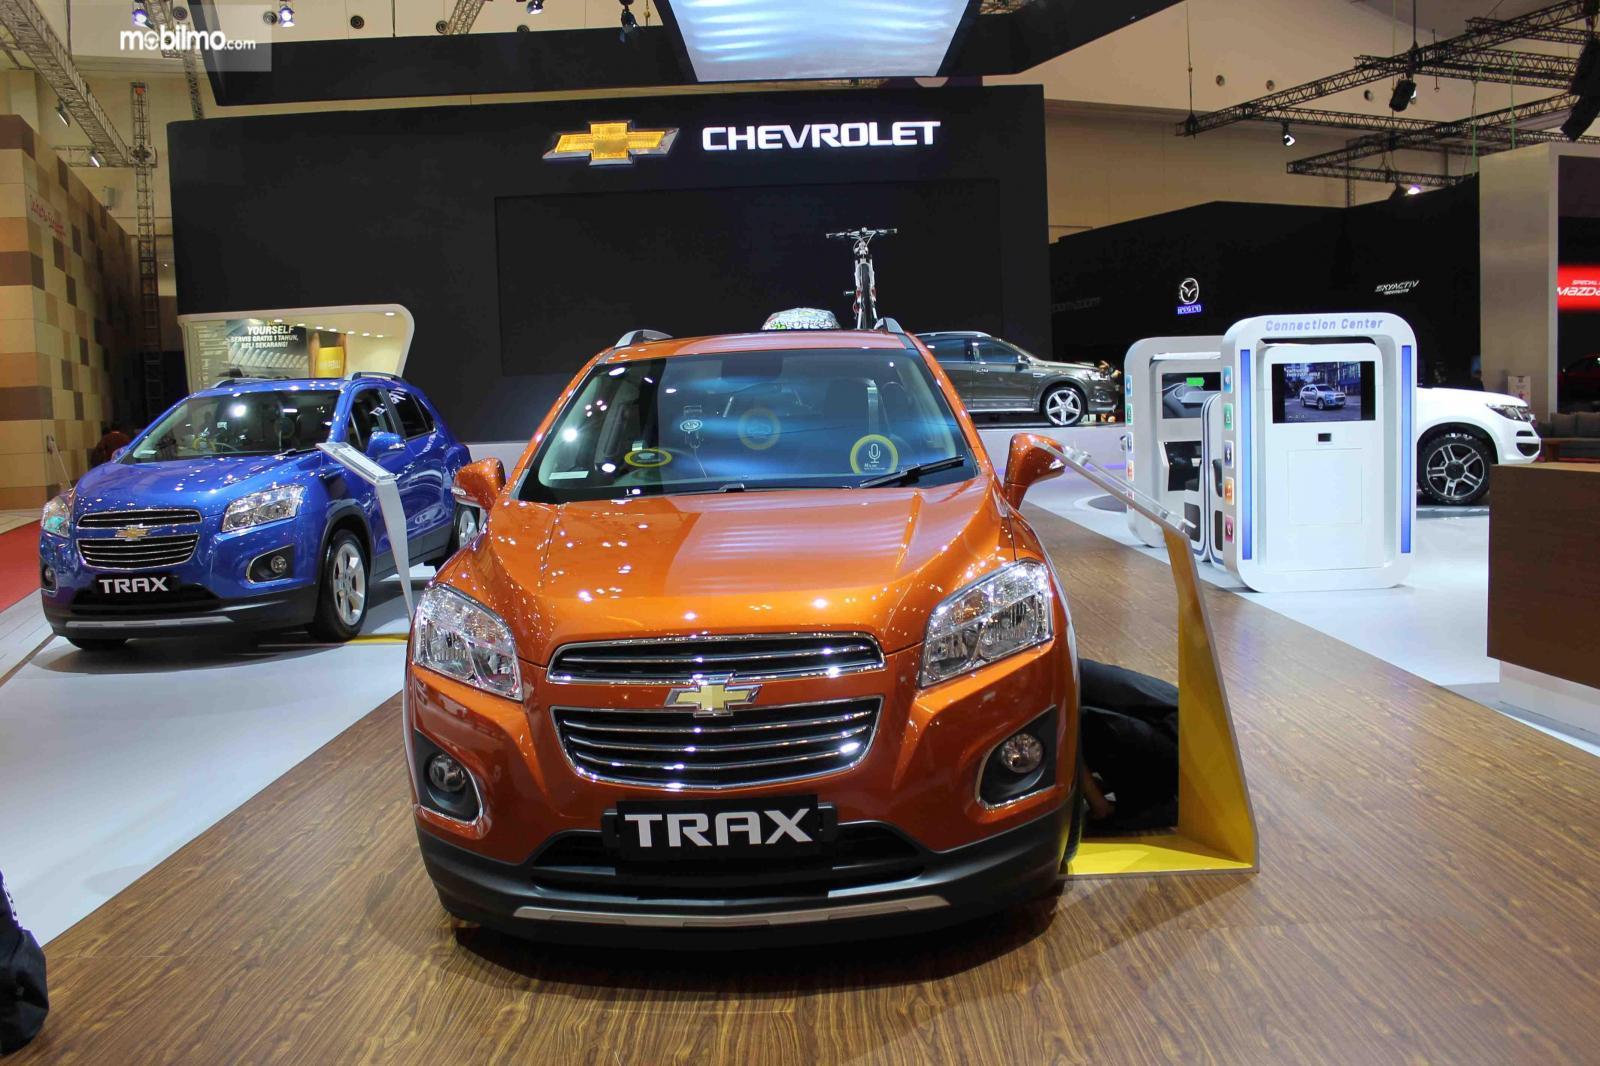 Foto Chevrolet Trax di pameran GIIAS 2016